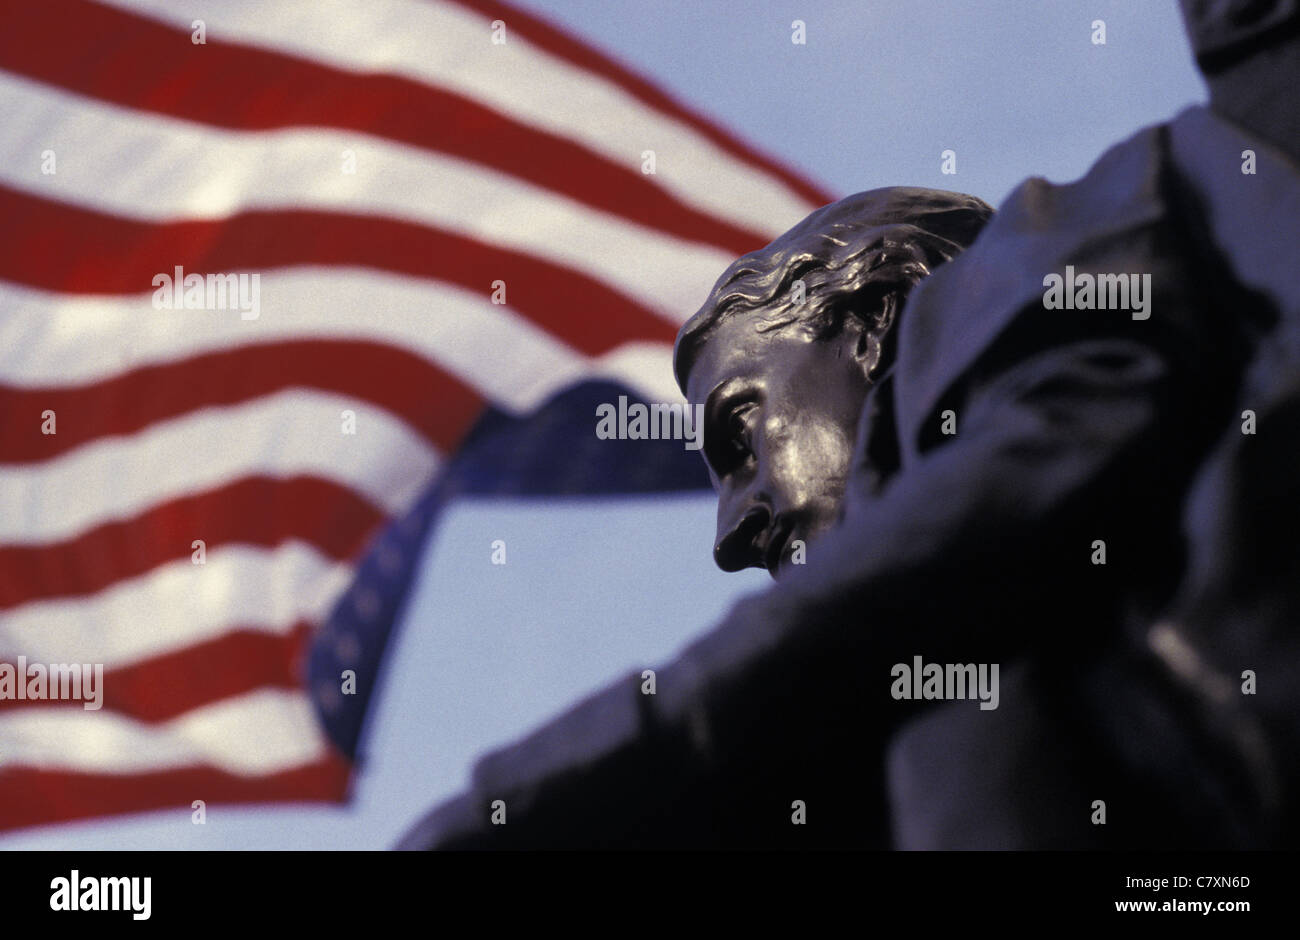 USA, Massachussetts, Cambridge: close up on statue and american flag at Harvard University - Stock Image